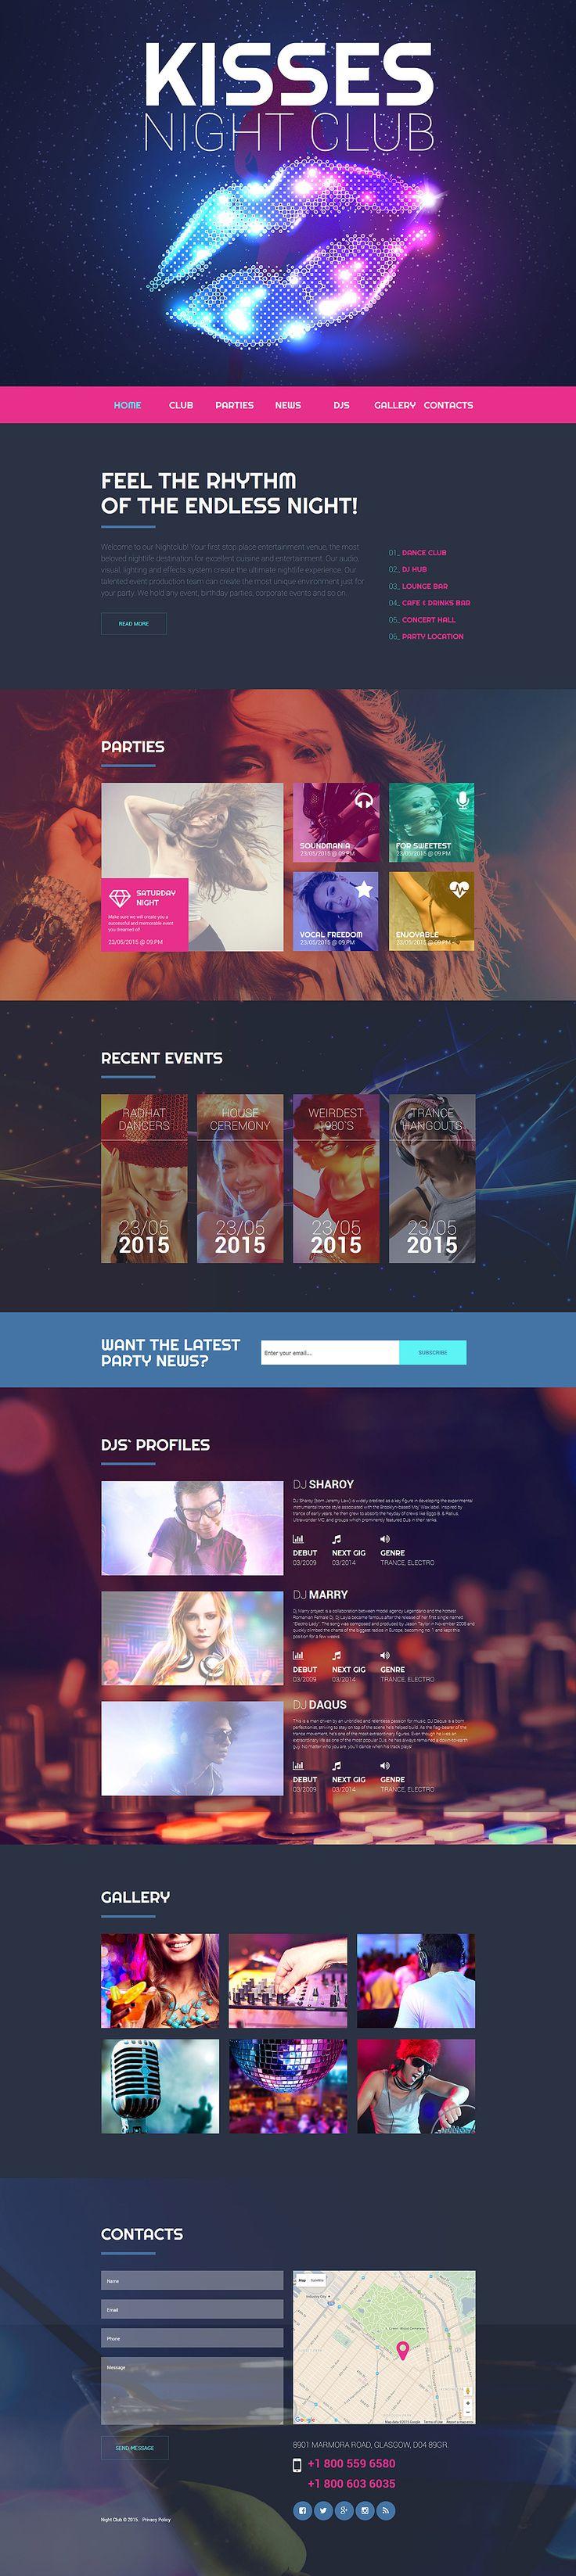 Nighttime Entertainment Website Template #nightclub http://www.templatemonster.com/website-templates/55735.html?utm_source=pinterest&utm_medium=timeline&utm_campaign=55735